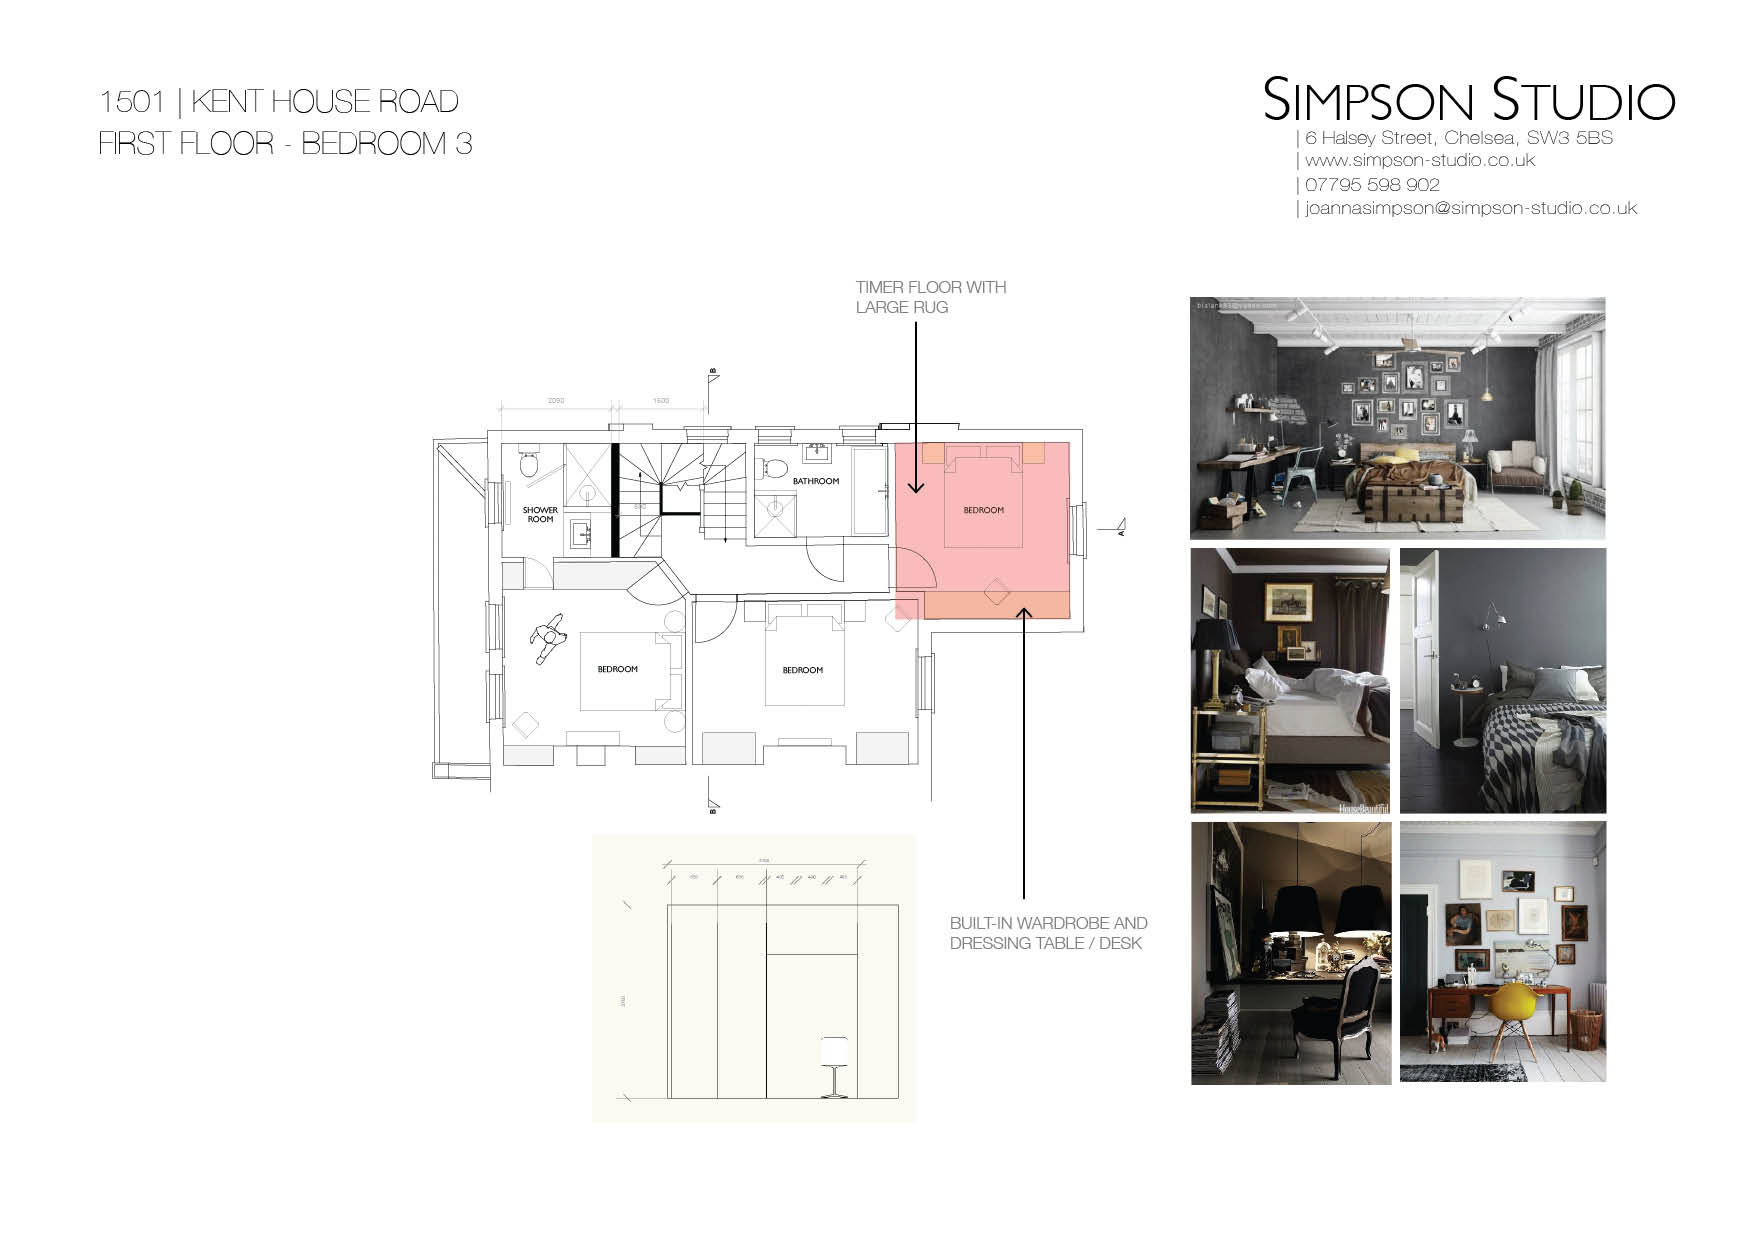 Kent House Road Room Planning27.jpg